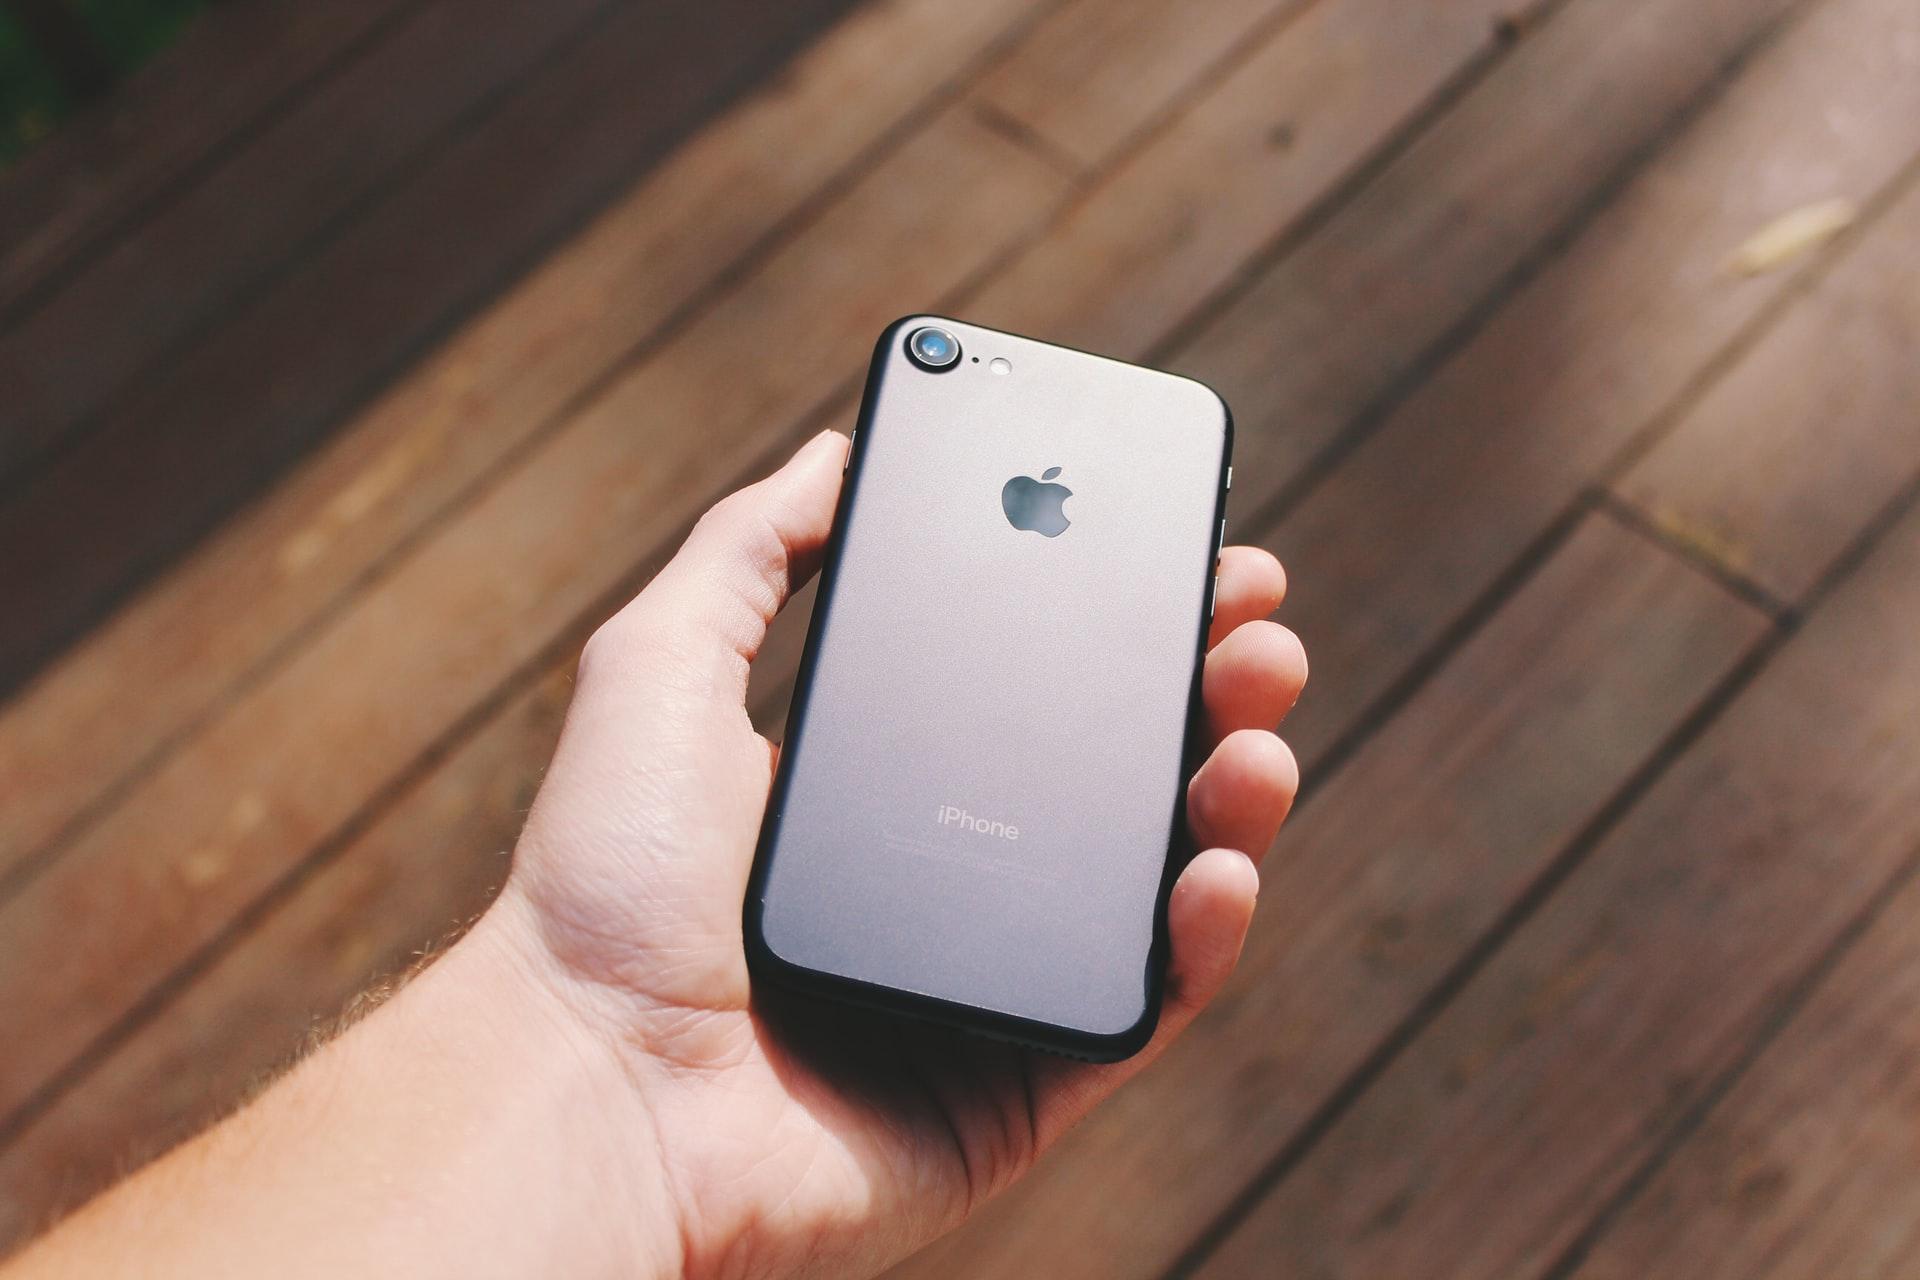 iPhoneをリセット(初期化)する方法と注意点|復元手順・できないときの対処法